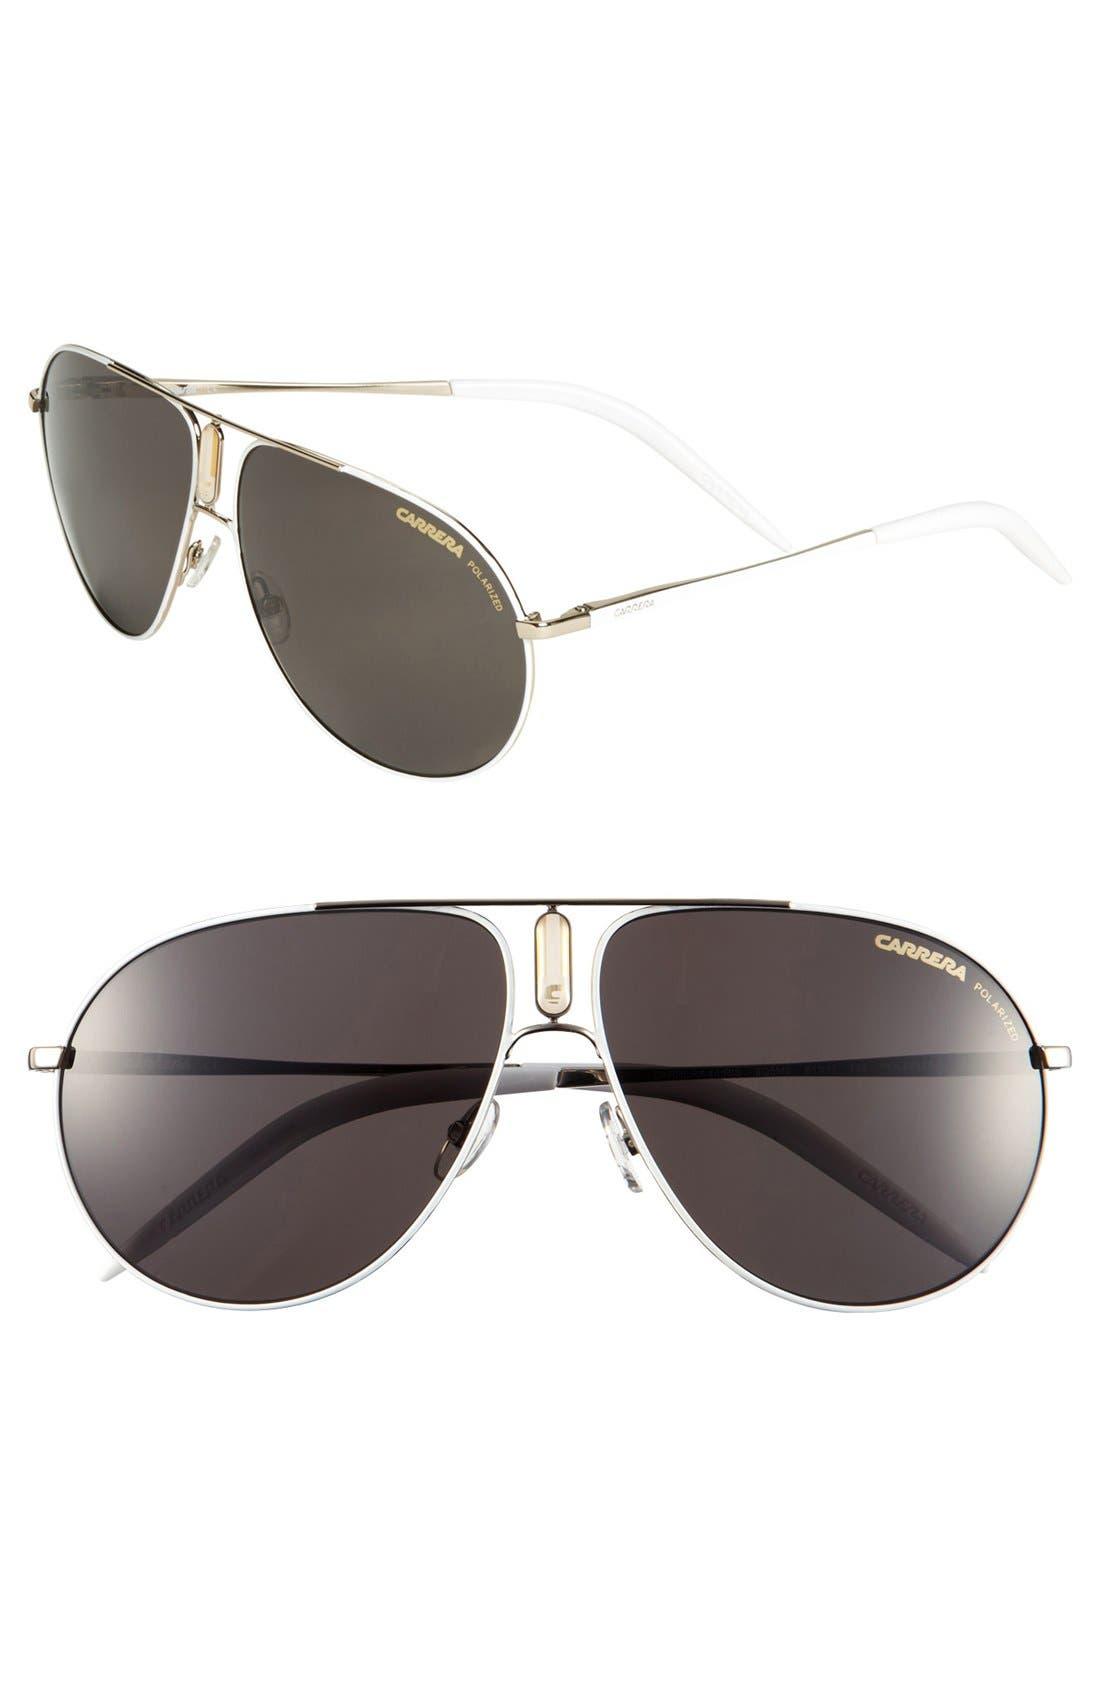 Main Image - Carrera Eyewear 61mm Polarized Sunglasses